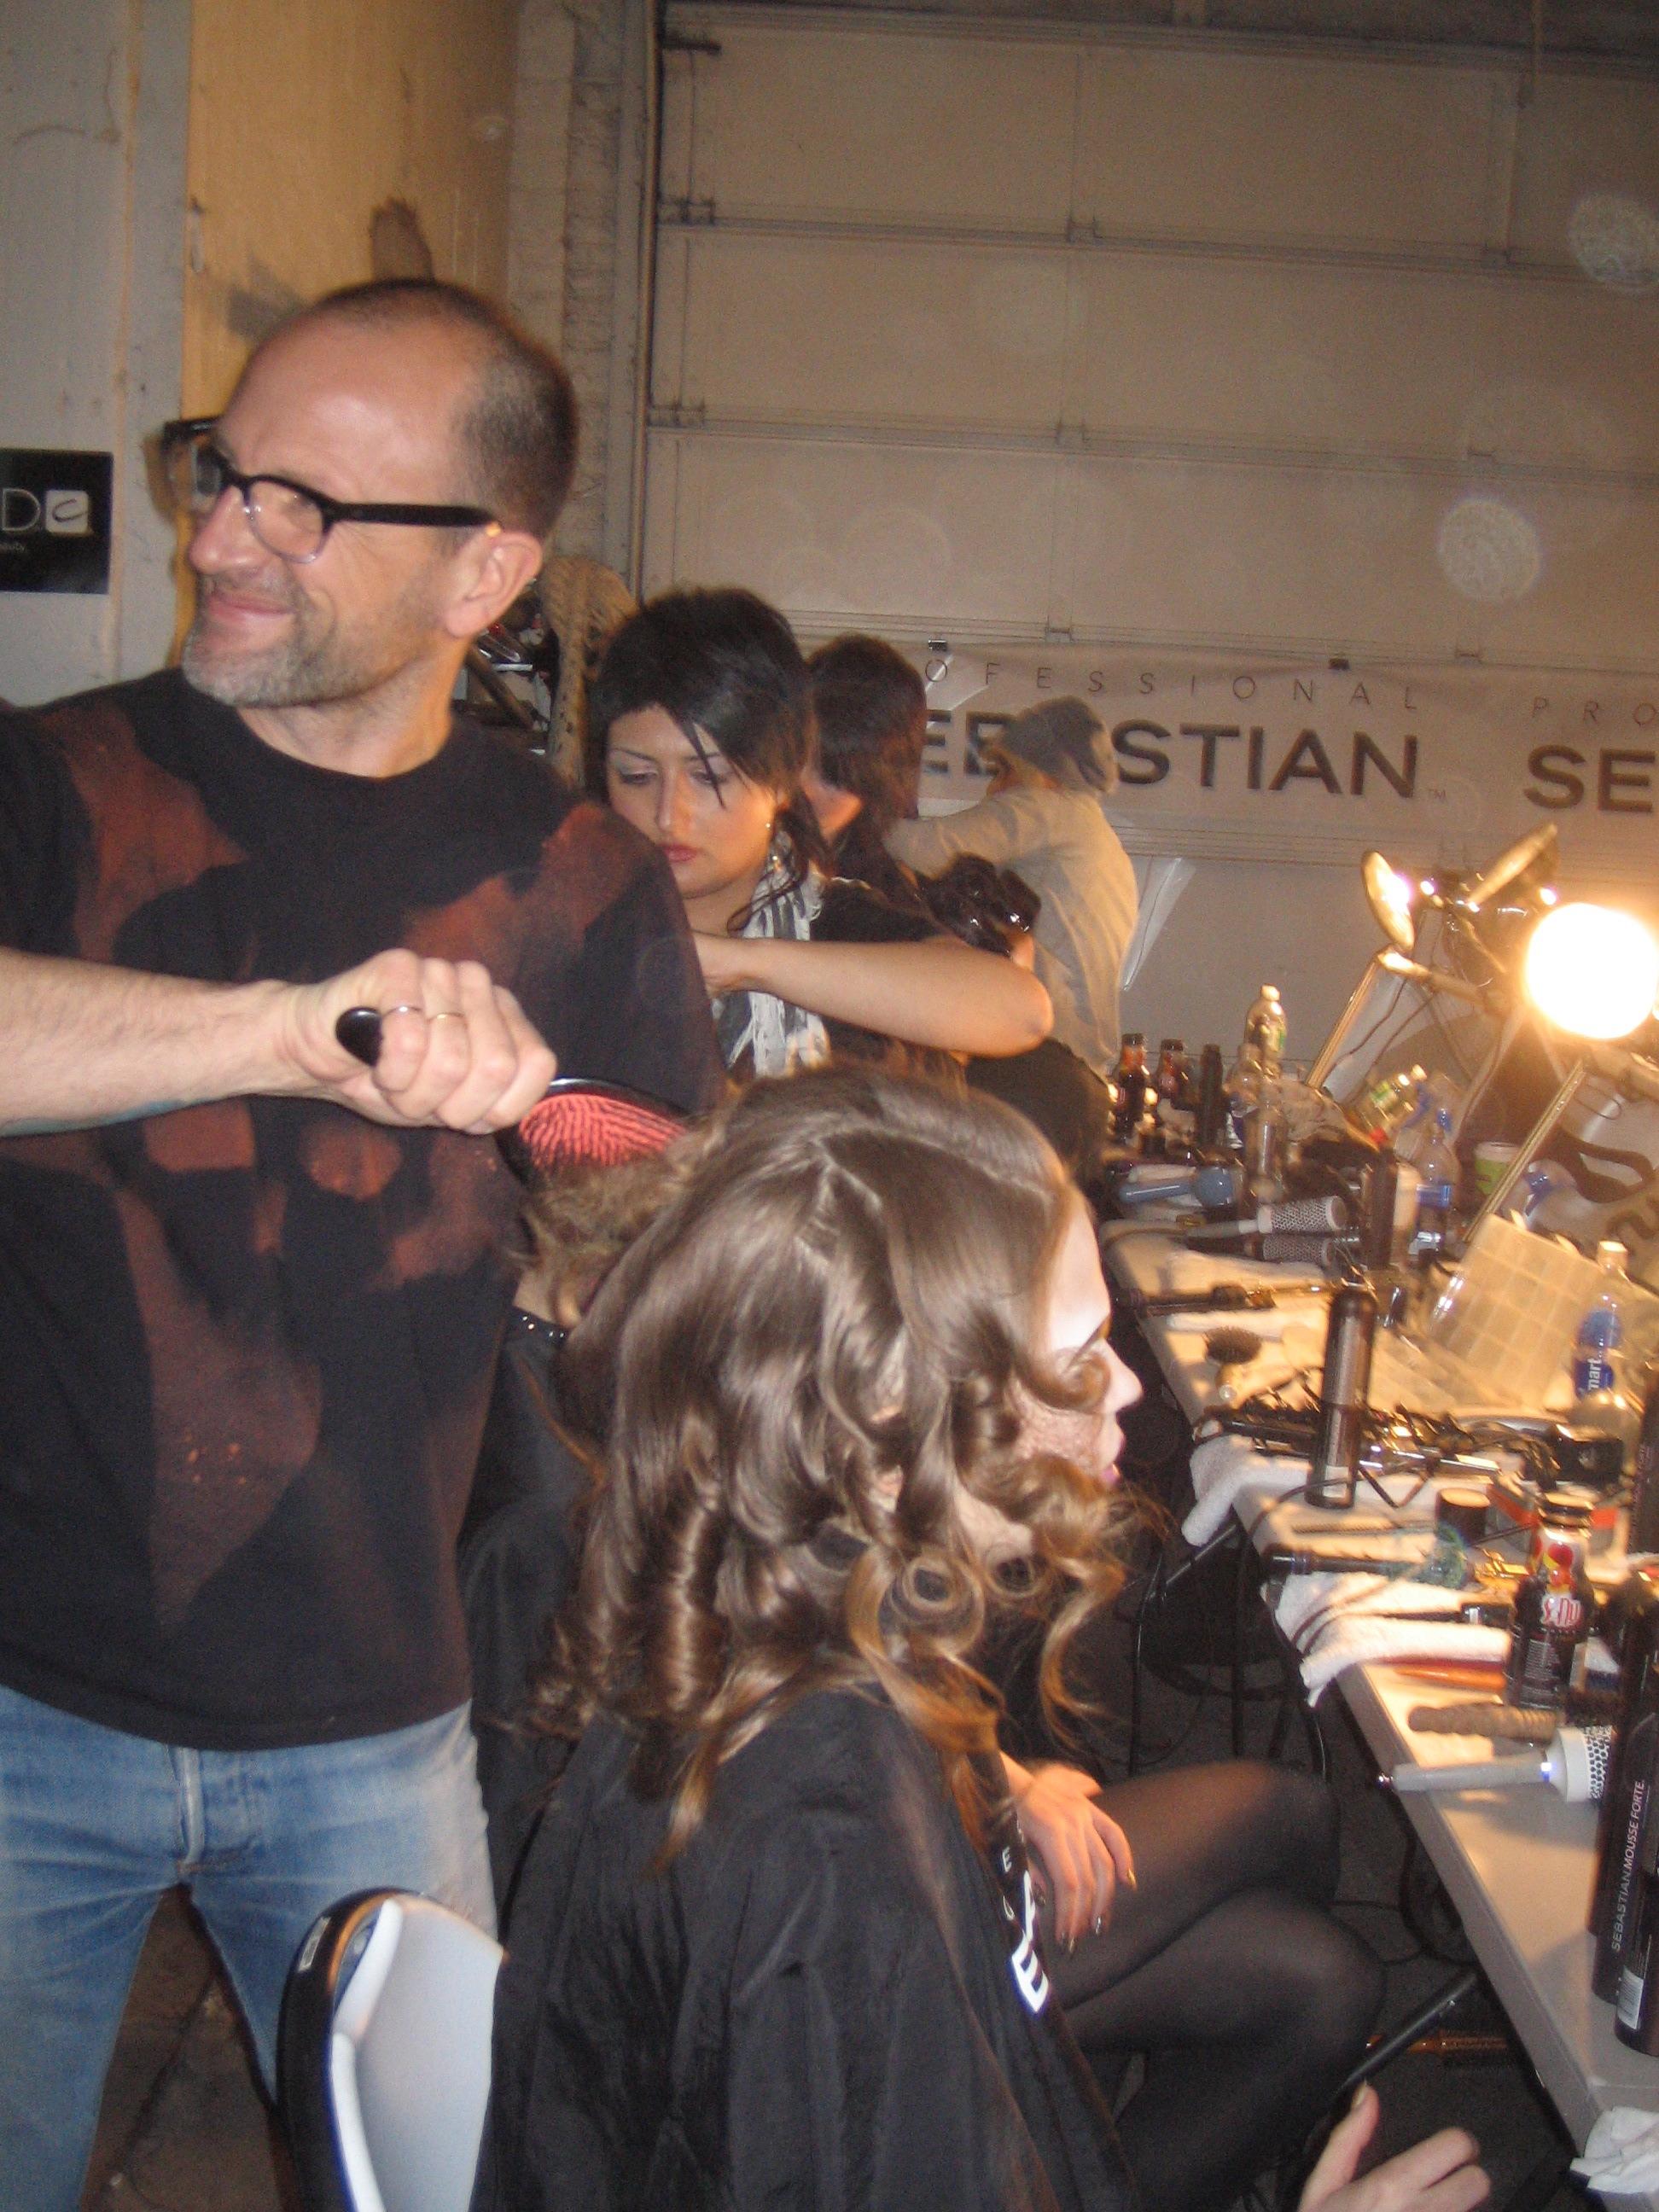 Lead hairstylist for Sebastian Professional Thomas Dunkin